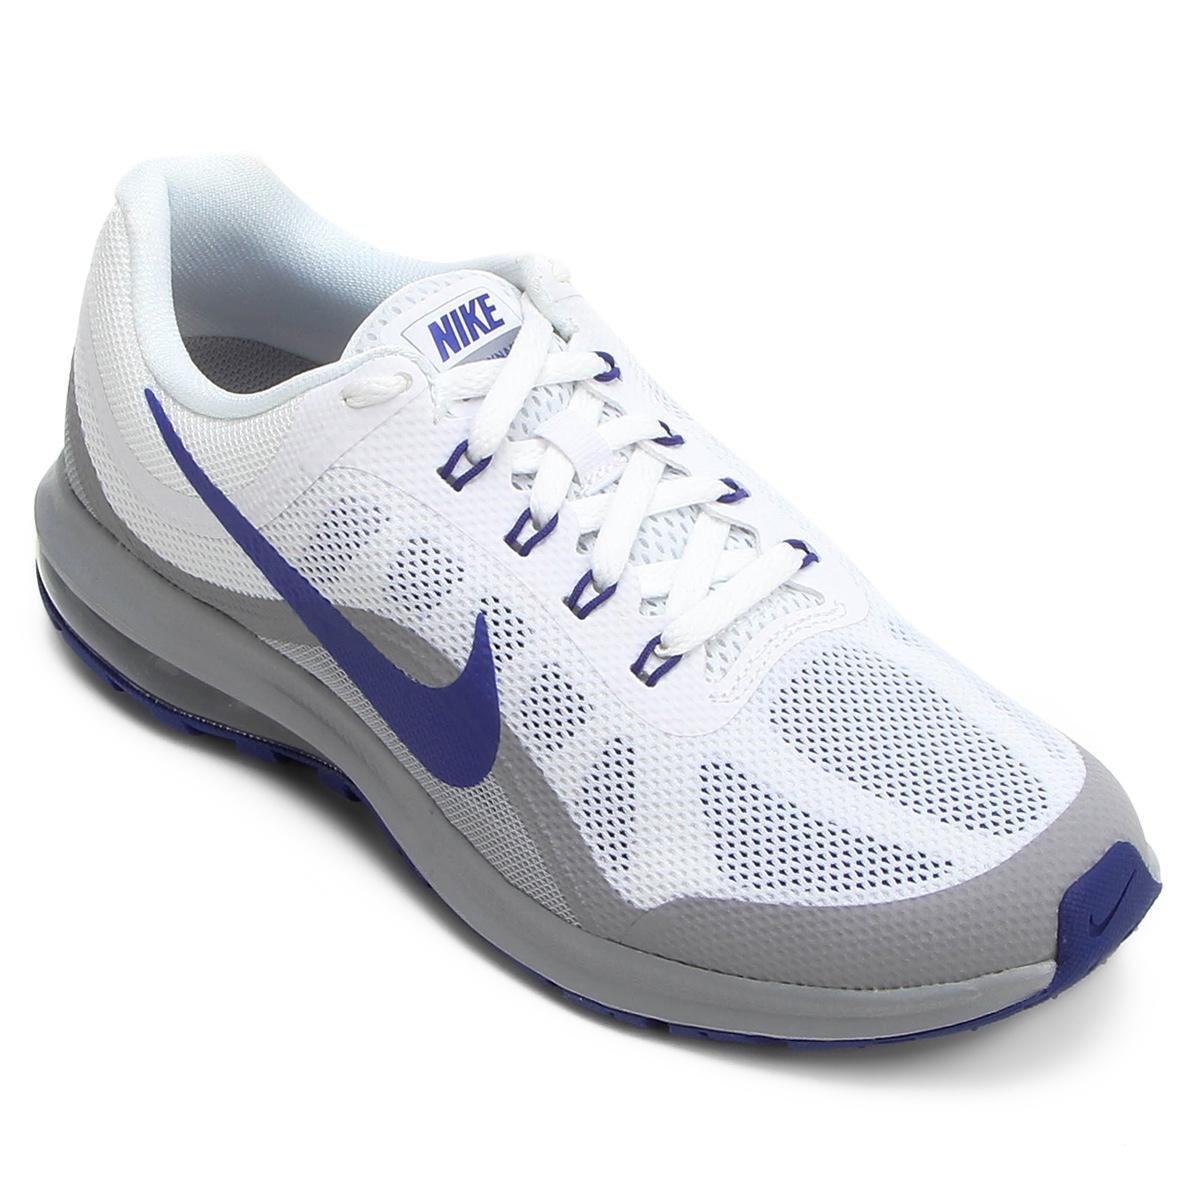 90402cb589d Tênis Nike Air Max Dynasty 2 Masculino - Compre Agora